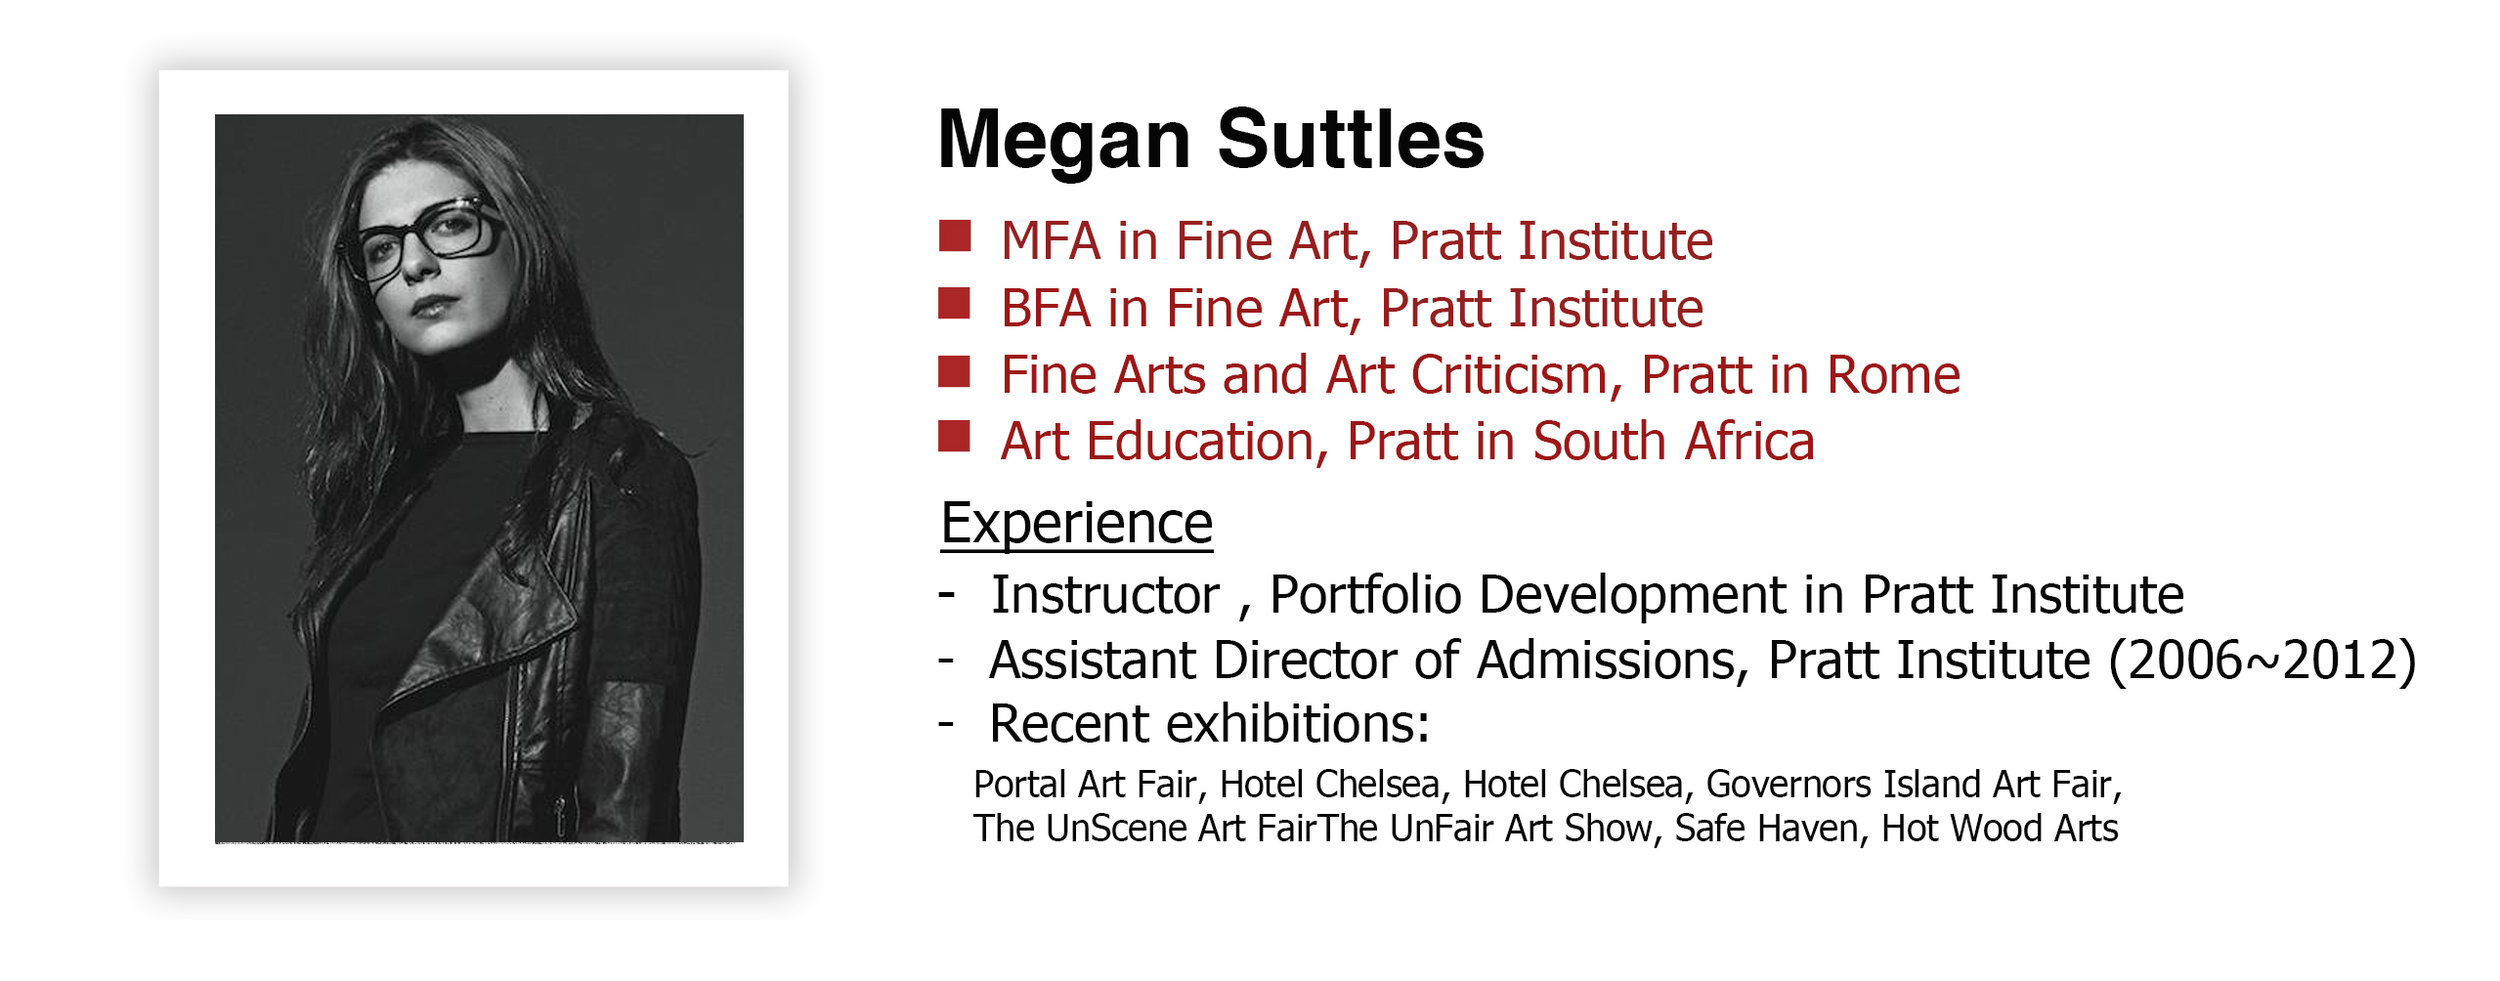 Megan Suttles.jpg